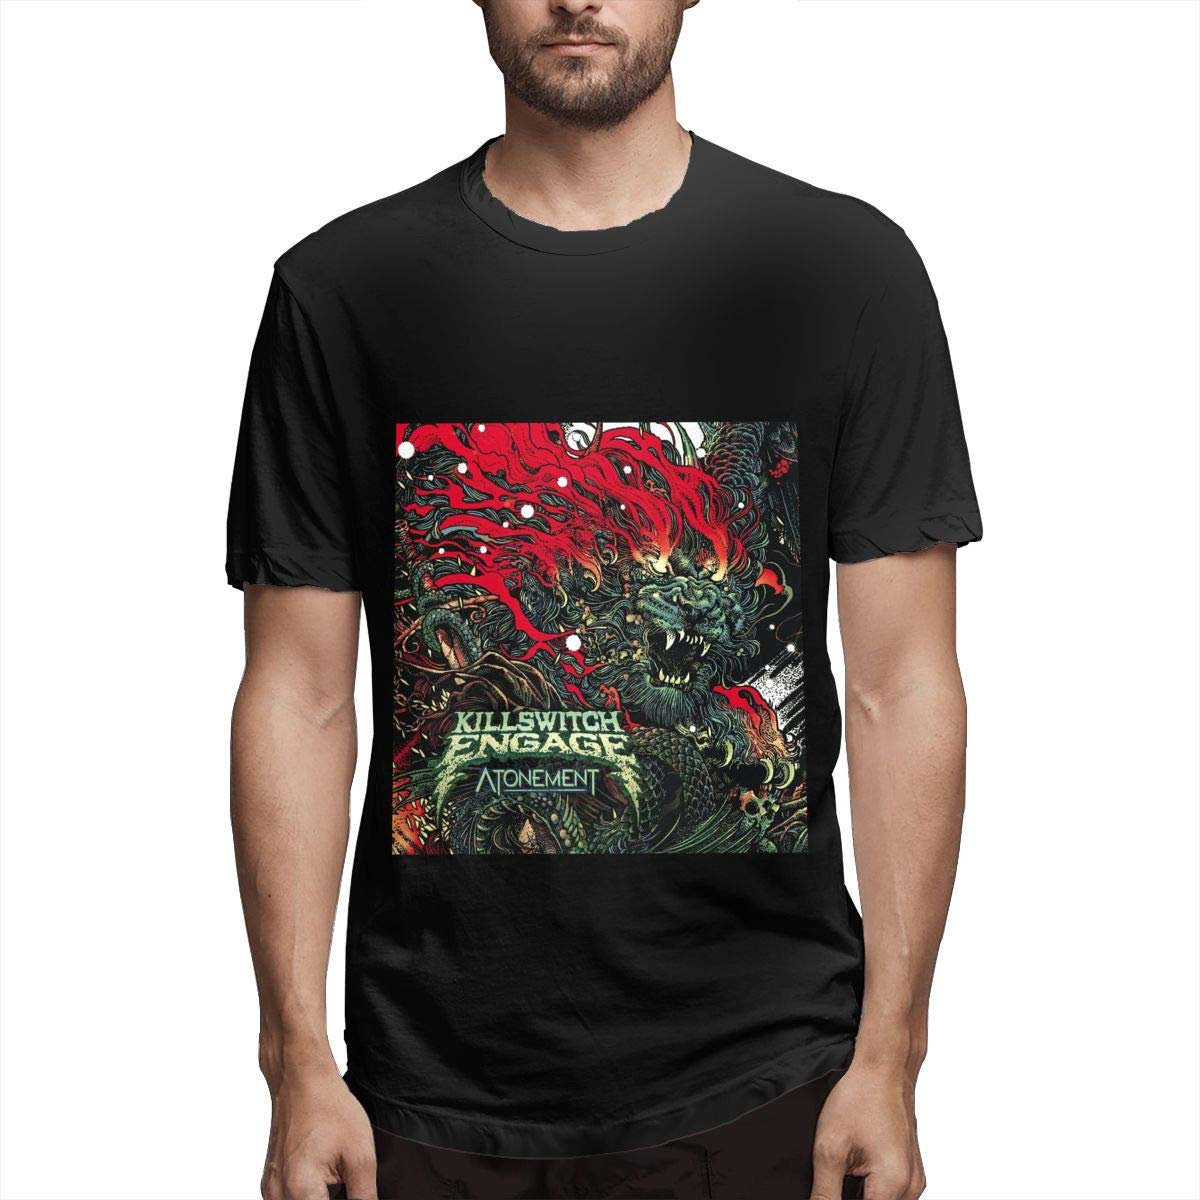 Lihehen S Killswitch Engage Retro Printing Round Neck Ts Shirts